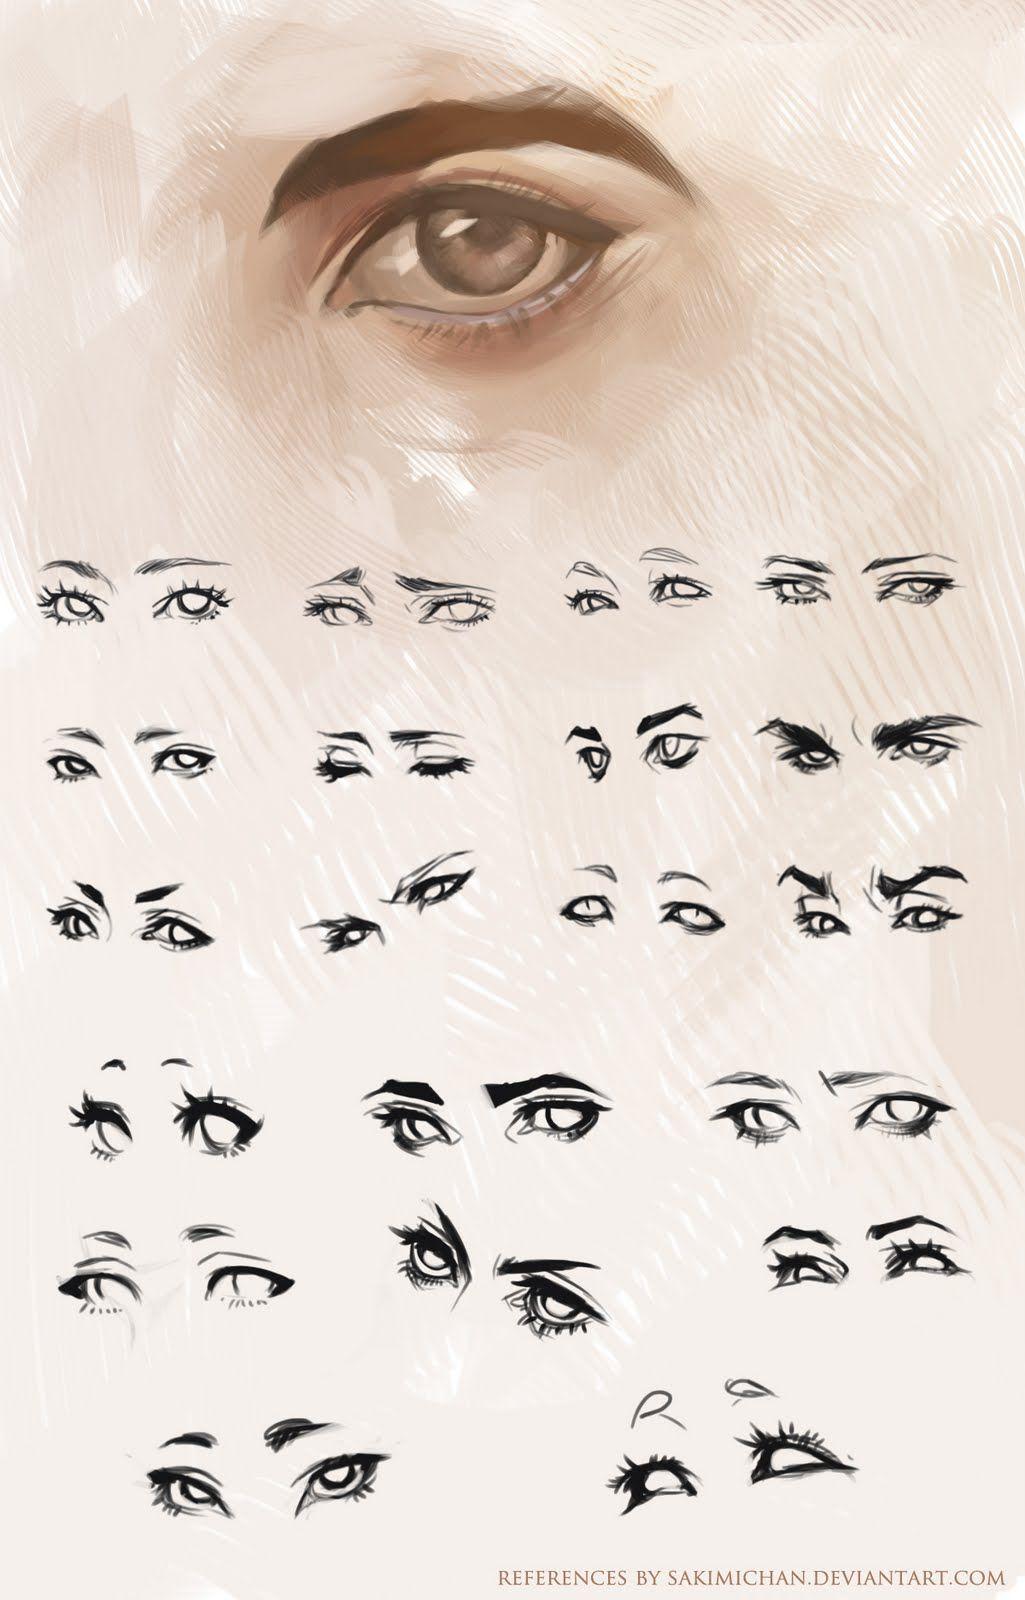 eye references Drawings, Eye drawing, Drawing people